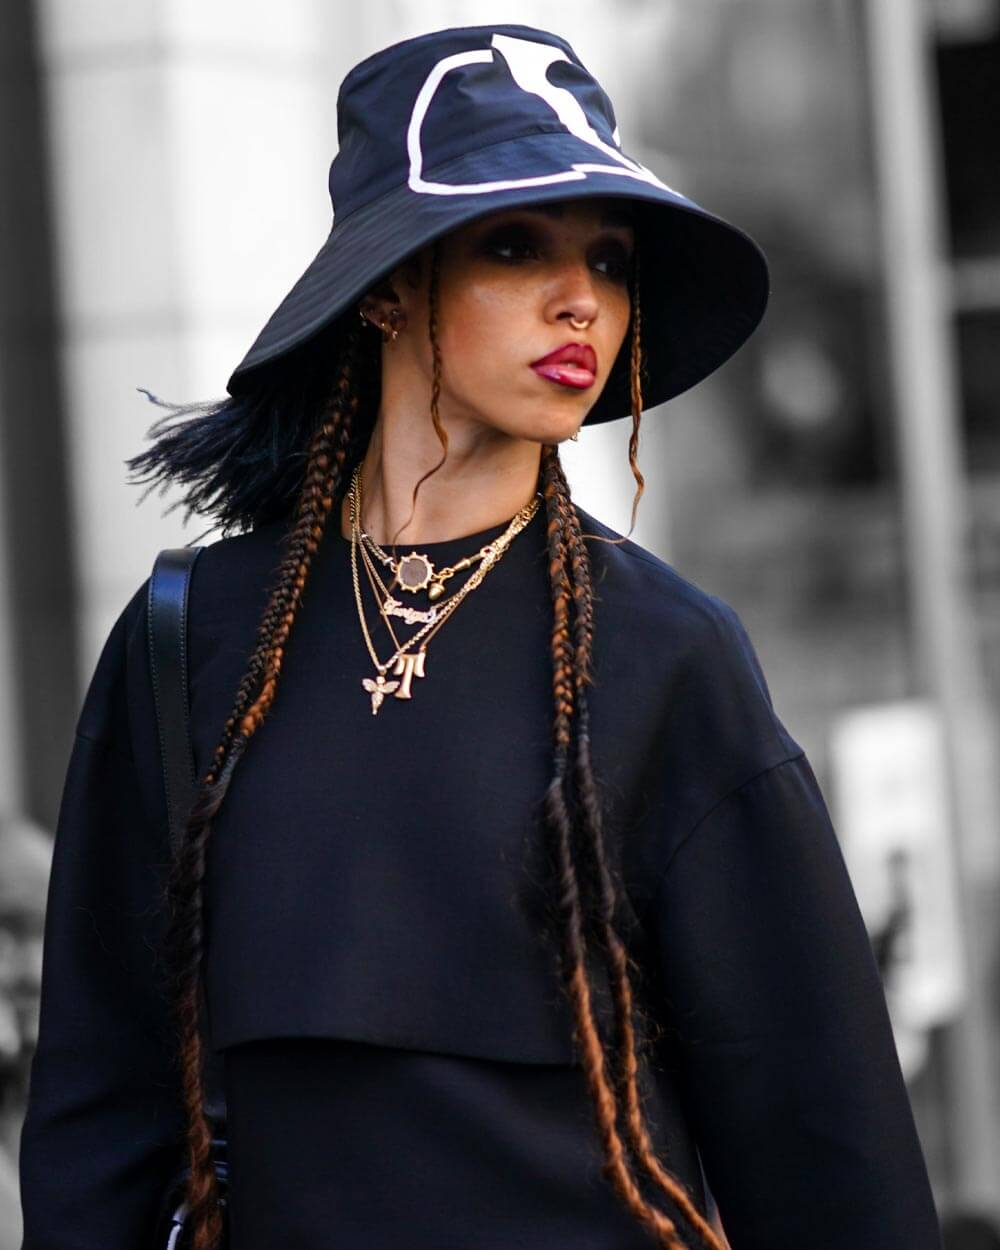 Bucket hat fashion trends 2021